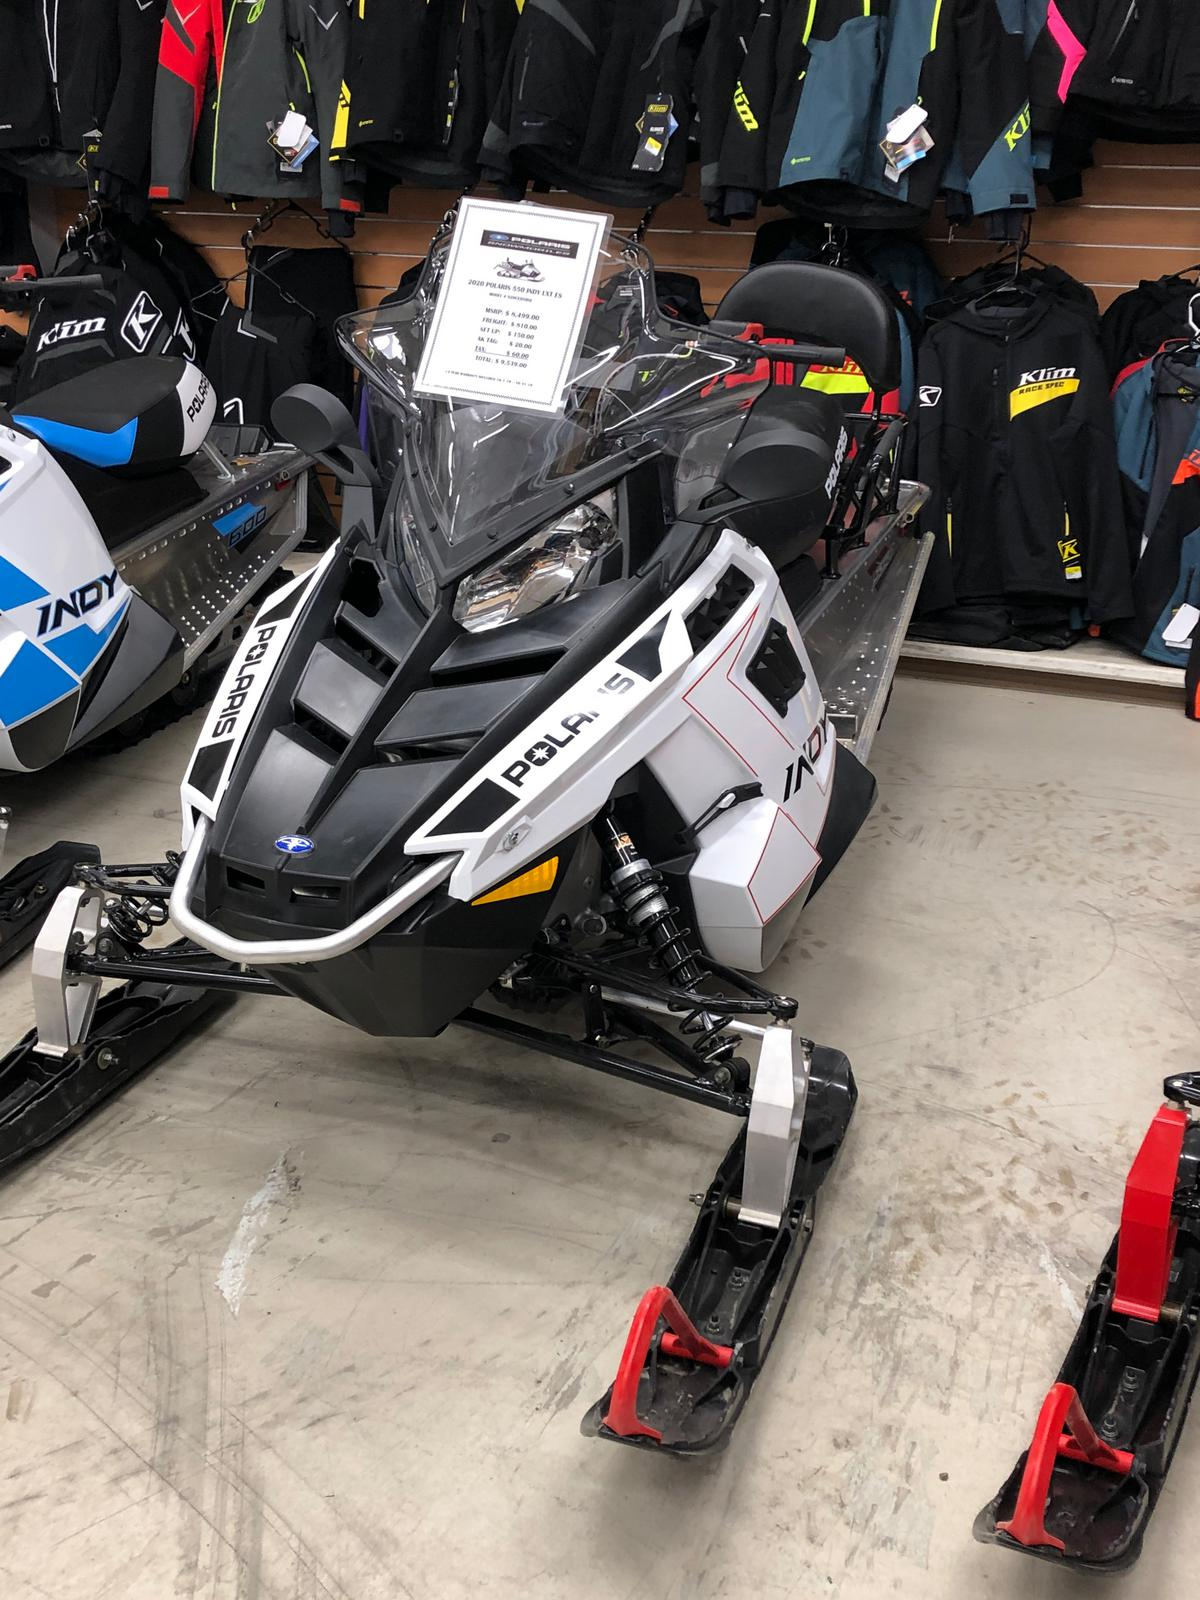 SP 2013-2014 2017-2018 Snowmobile PWC 220-25020 OEM# 3211122 Polaris HPX Snow Belt 600 Indy